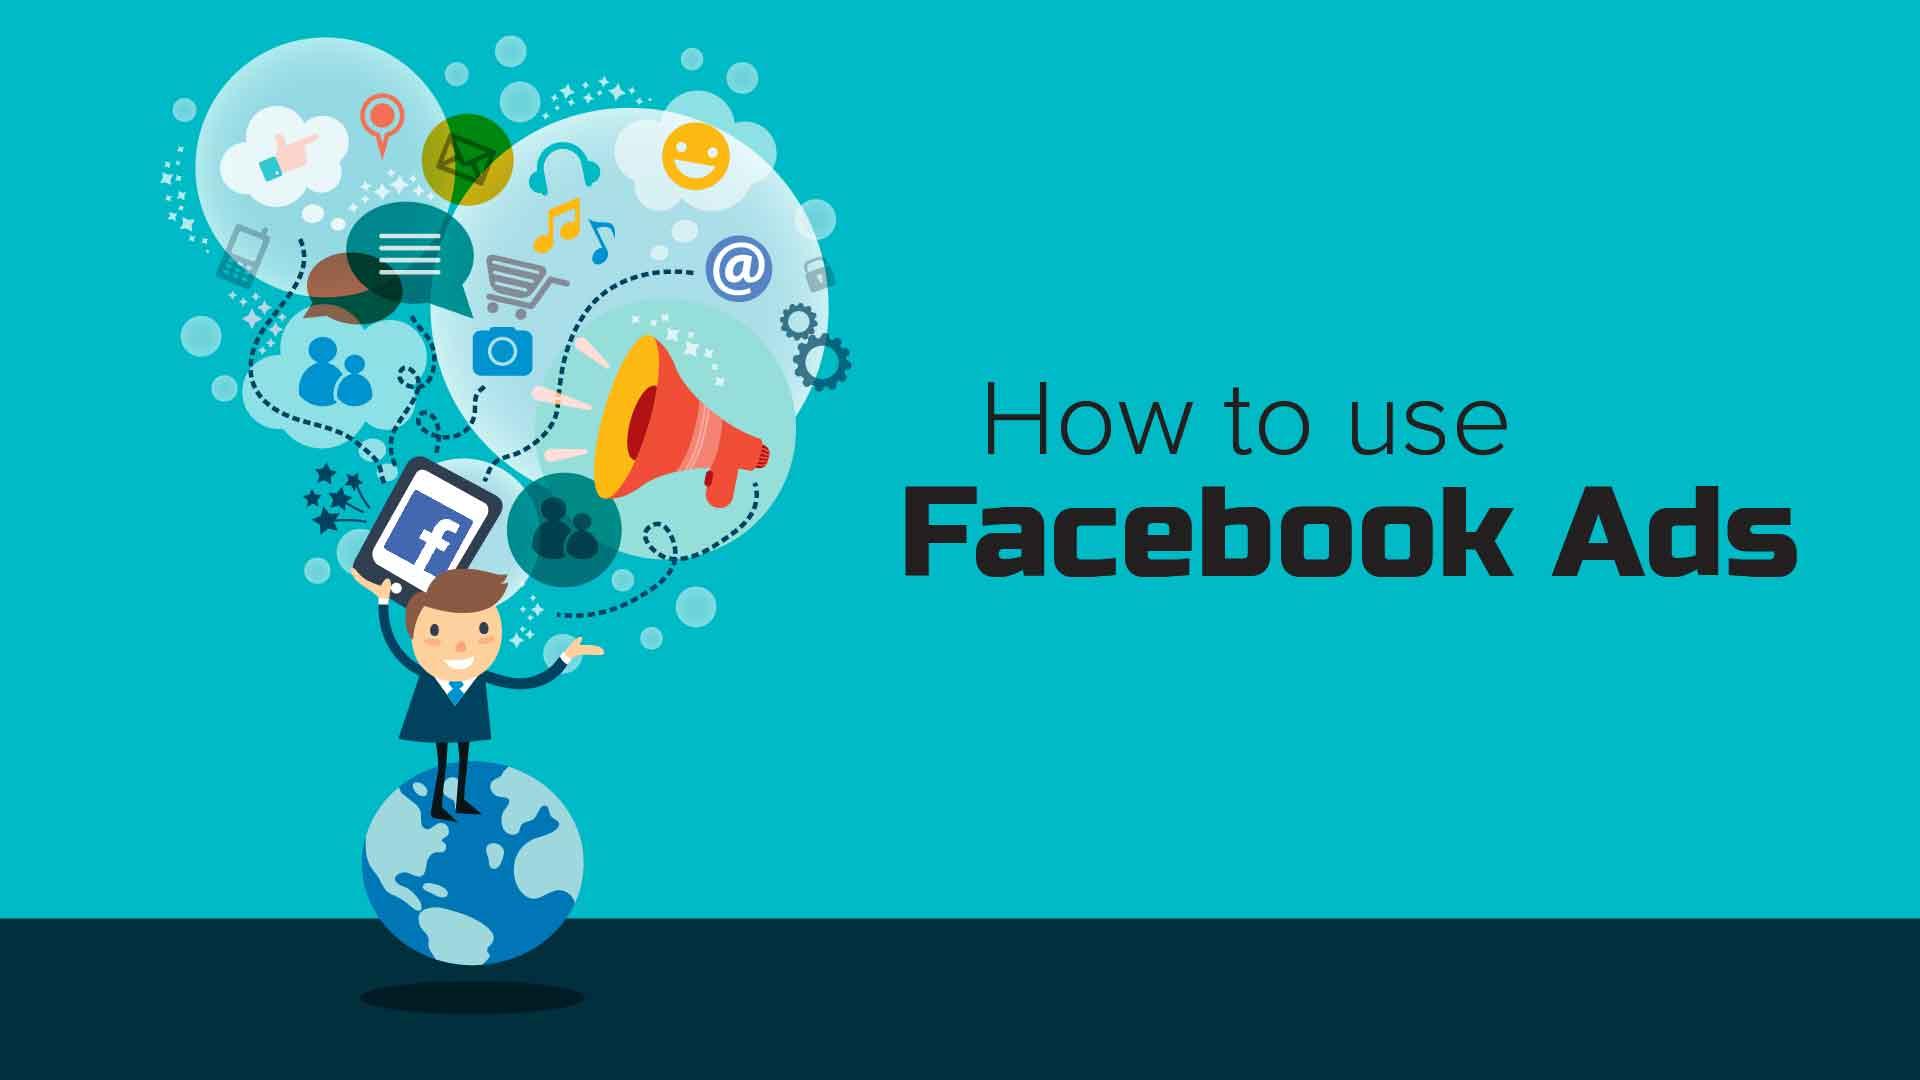 Facebook-Ads-Facebook-Events